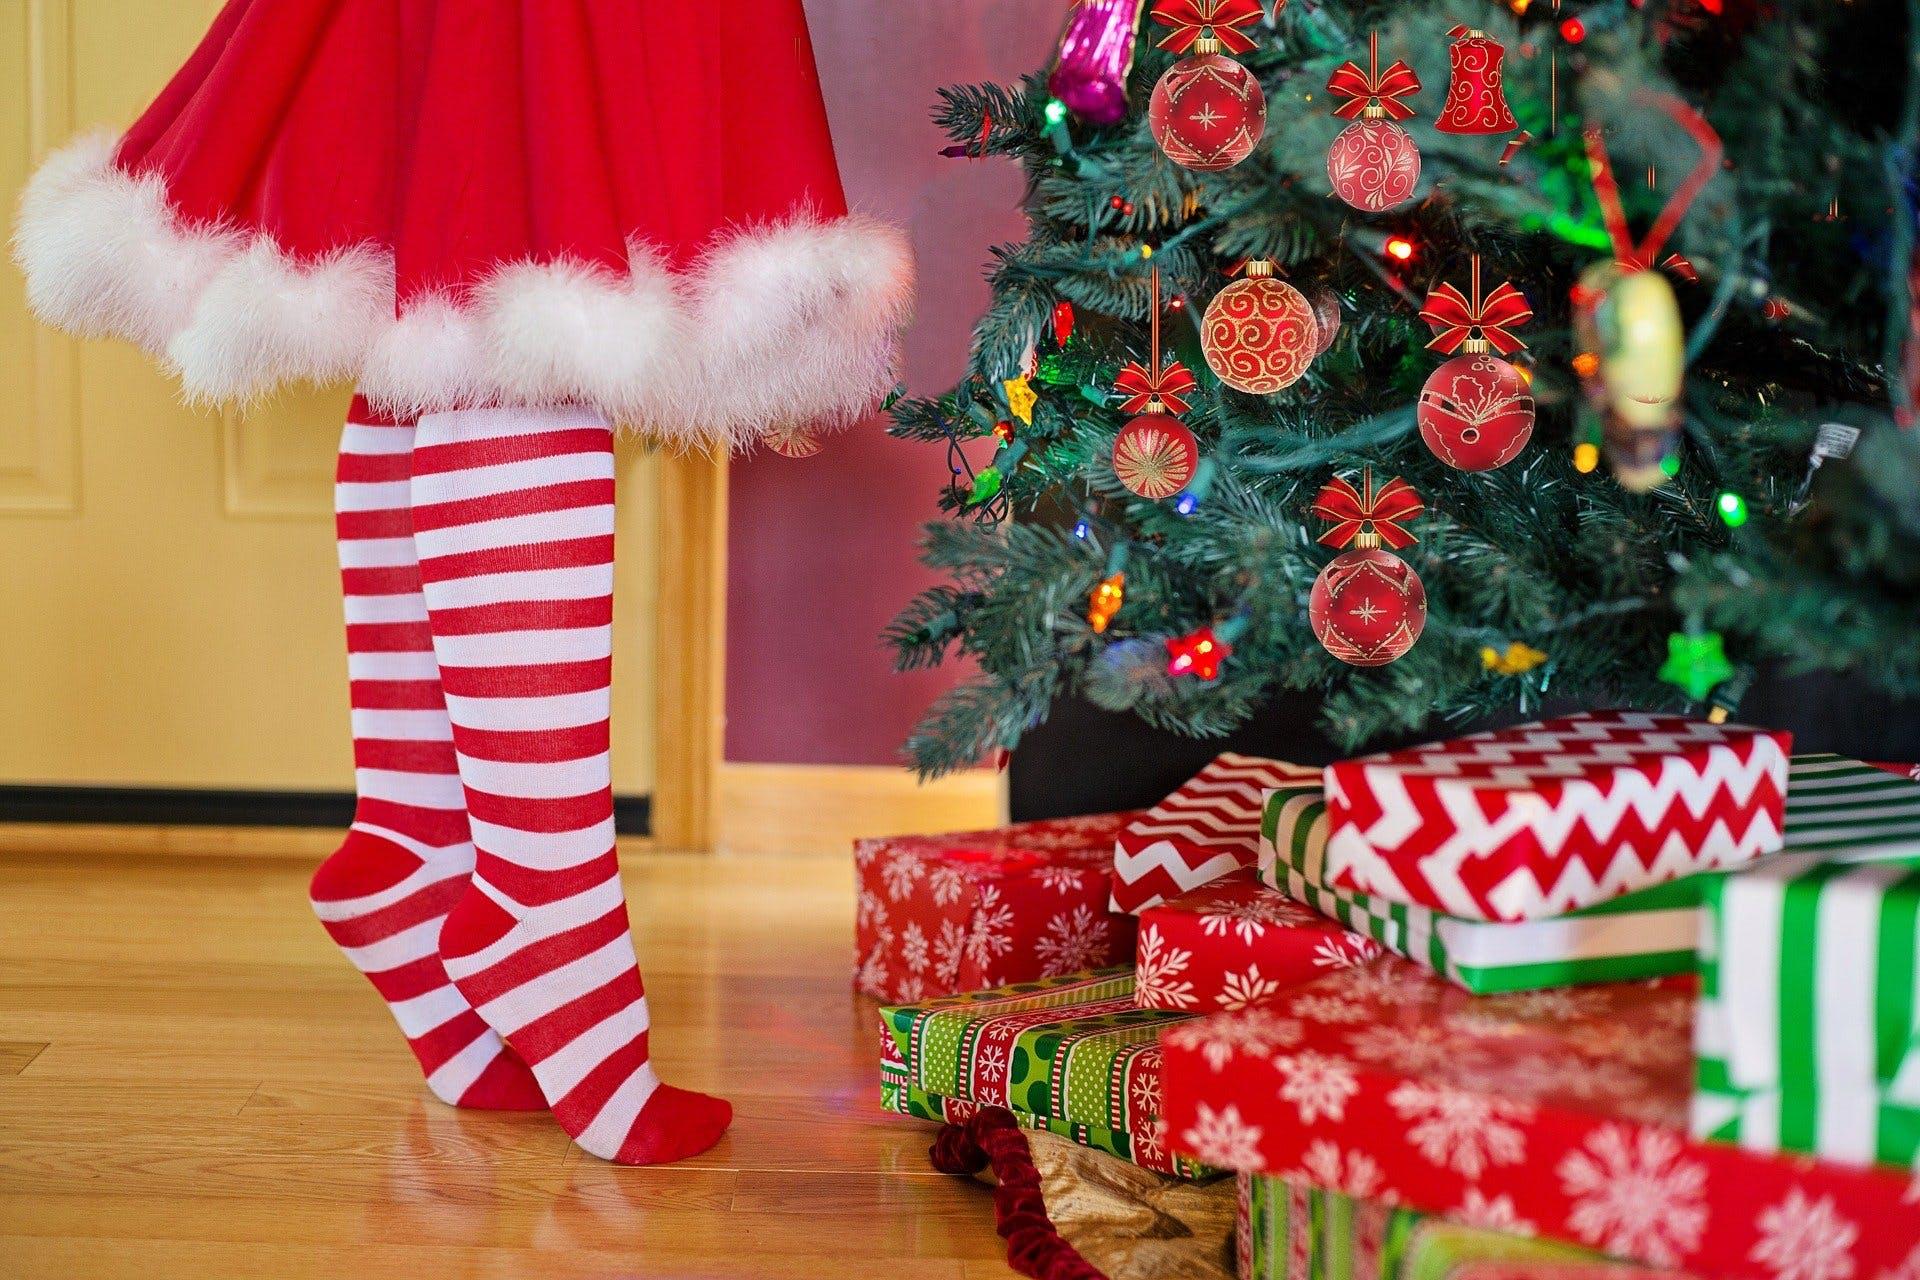 Bescherung am Weihnachtsbaum